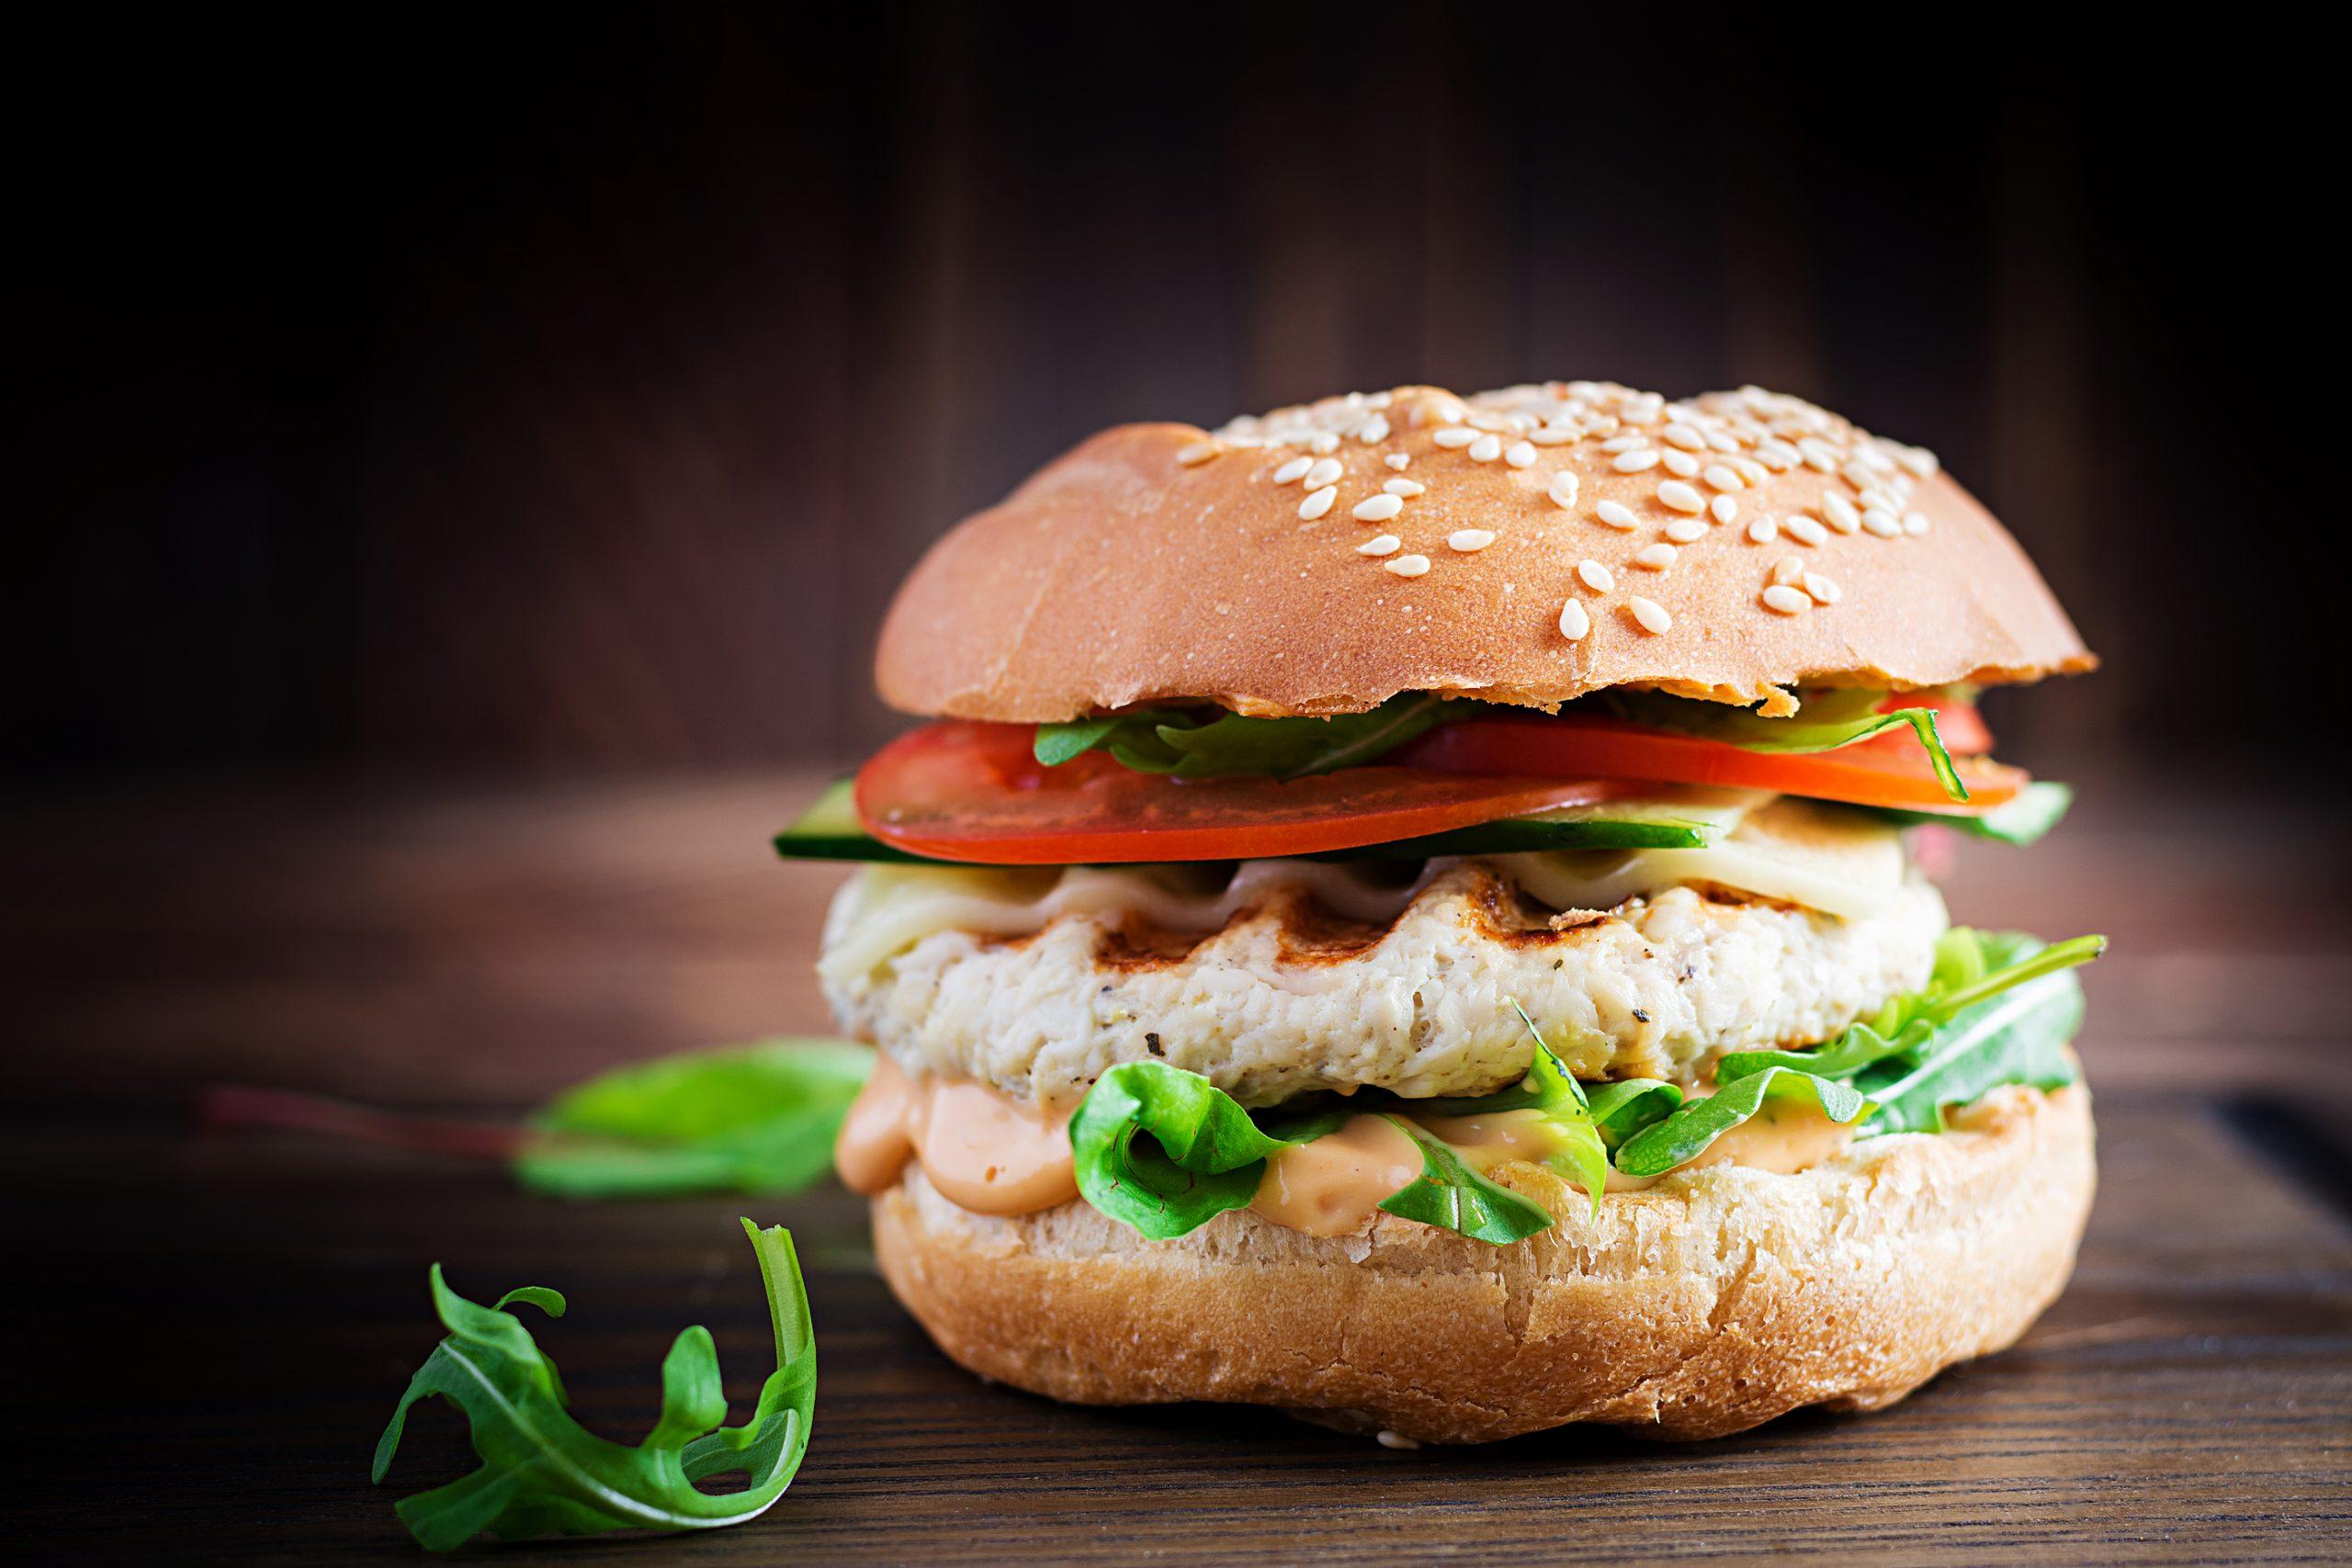 [RECIPE] Great-tasting turkey burgers with sweet mustard sauce